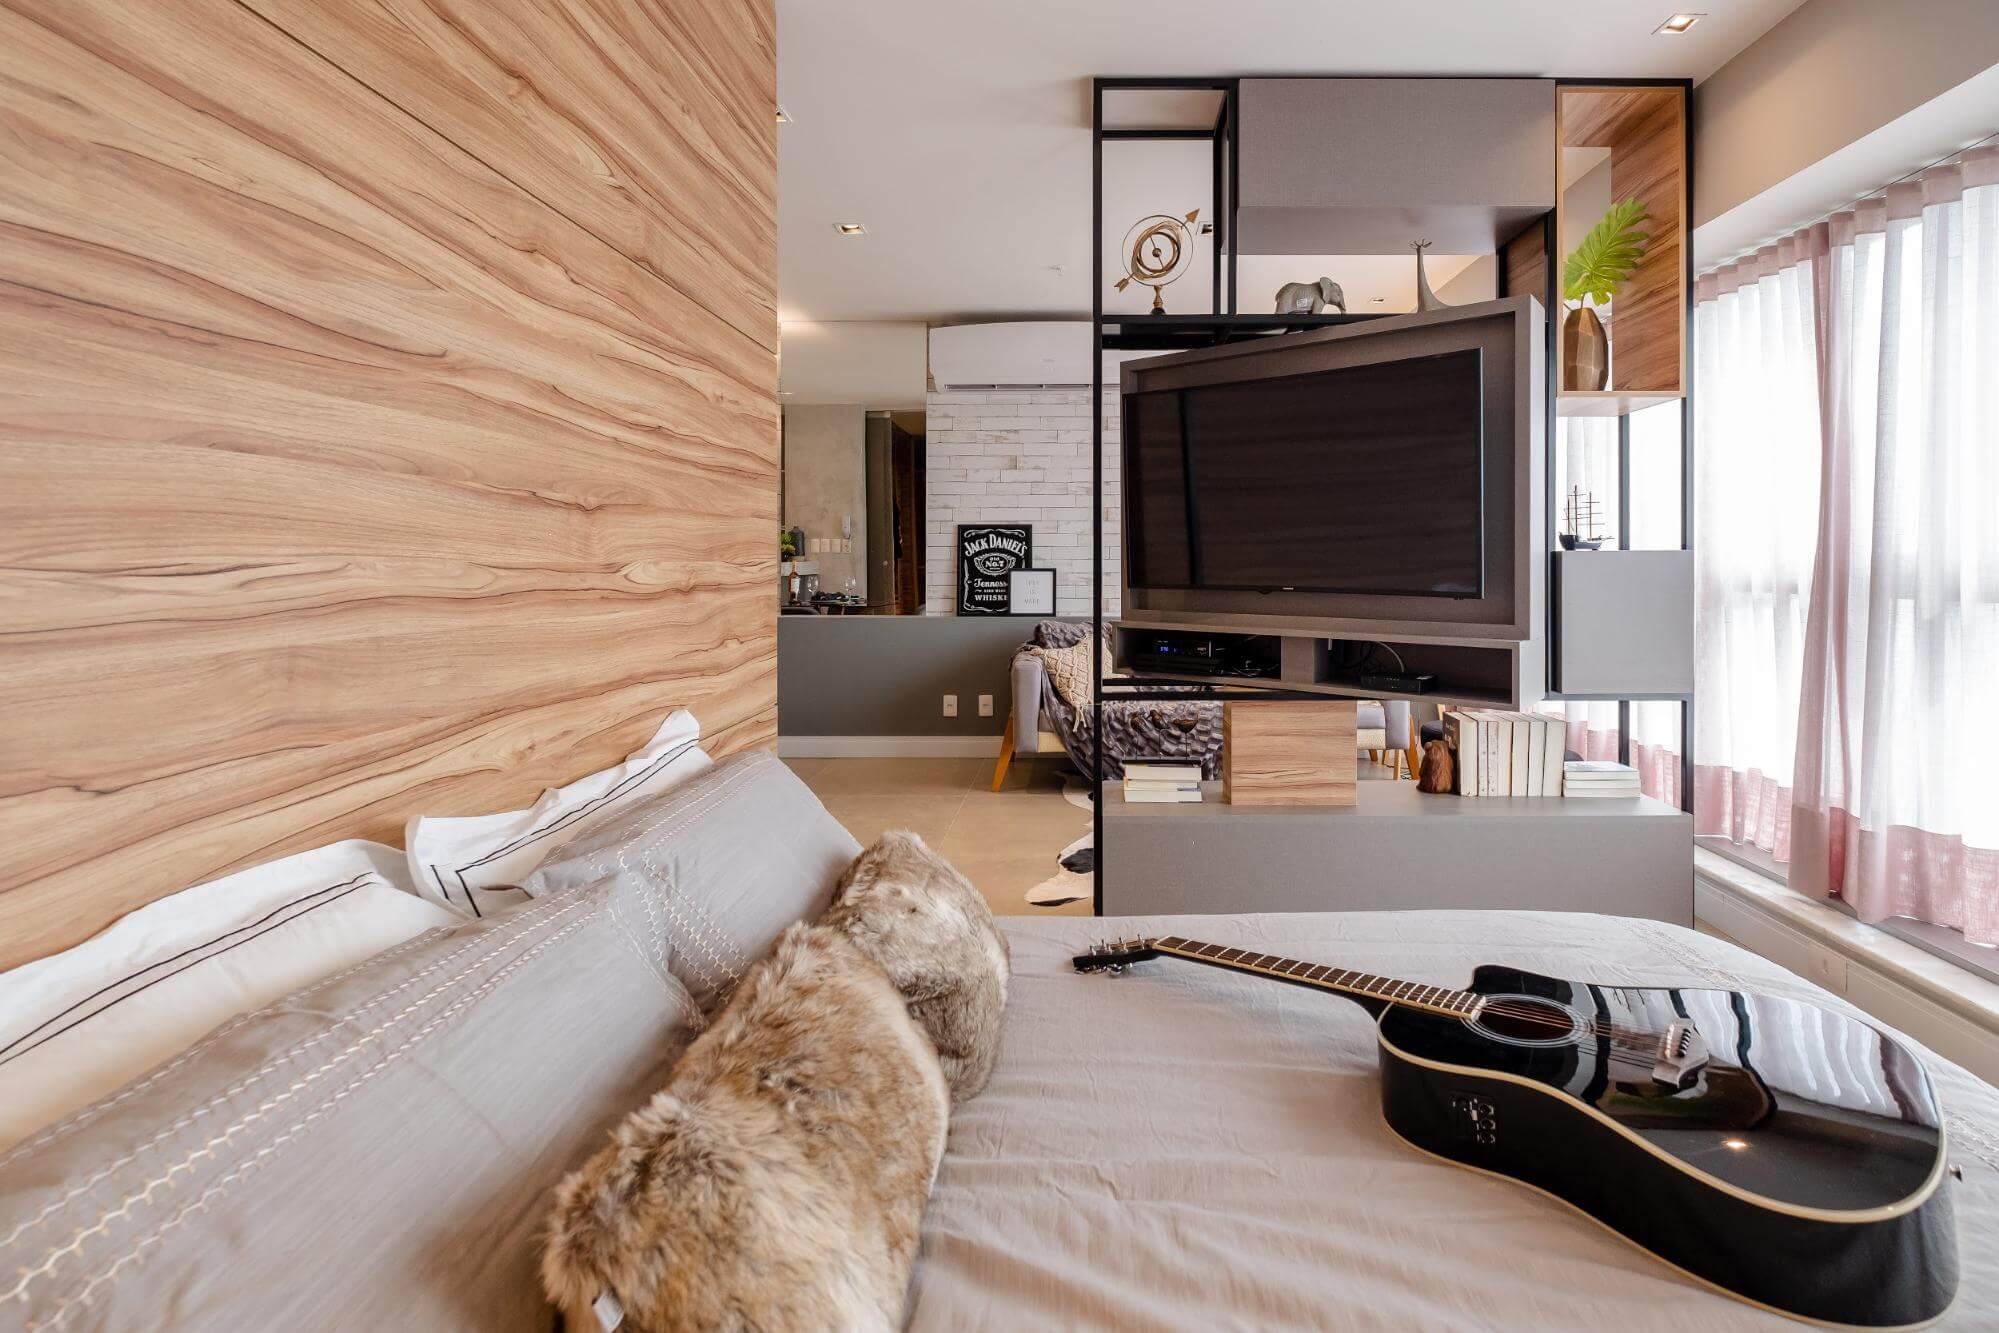 Apartamento pequeno - cortinas e tapetes